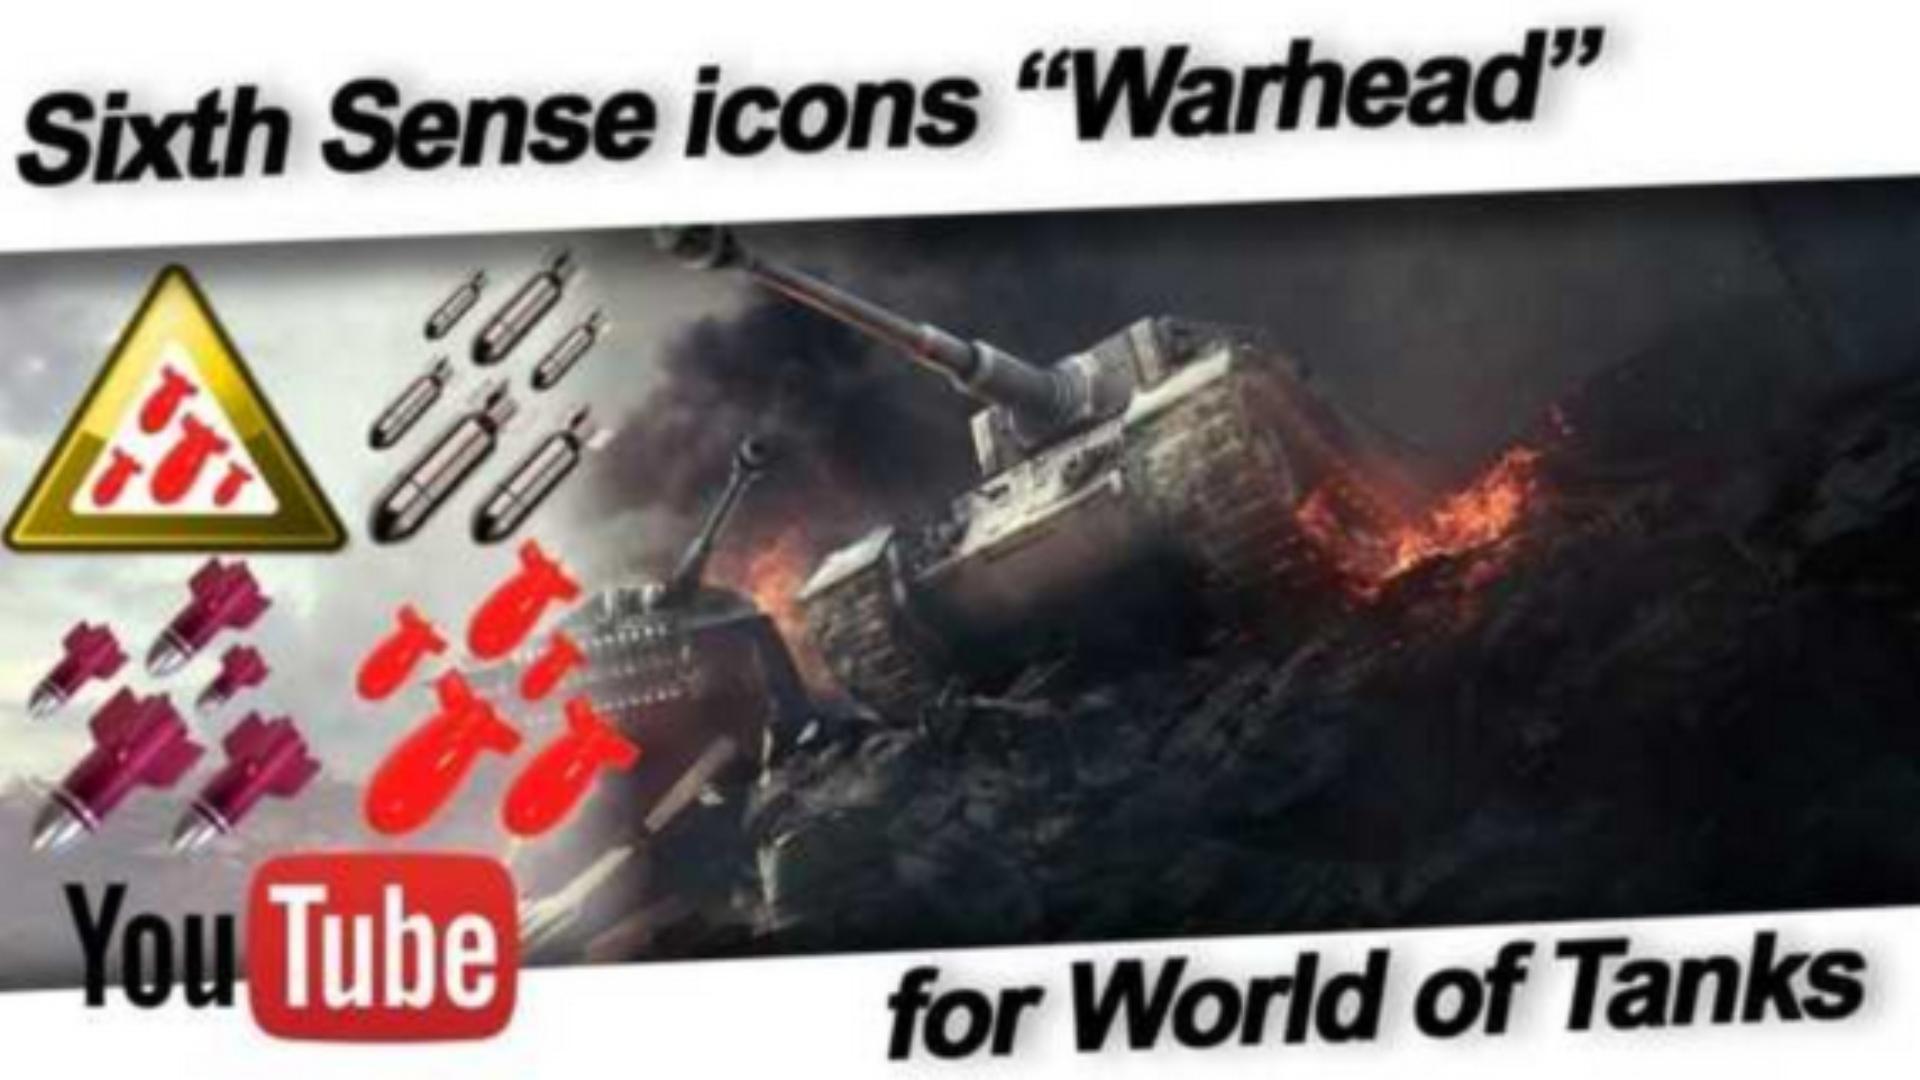 Sixth Sense icons Warhead